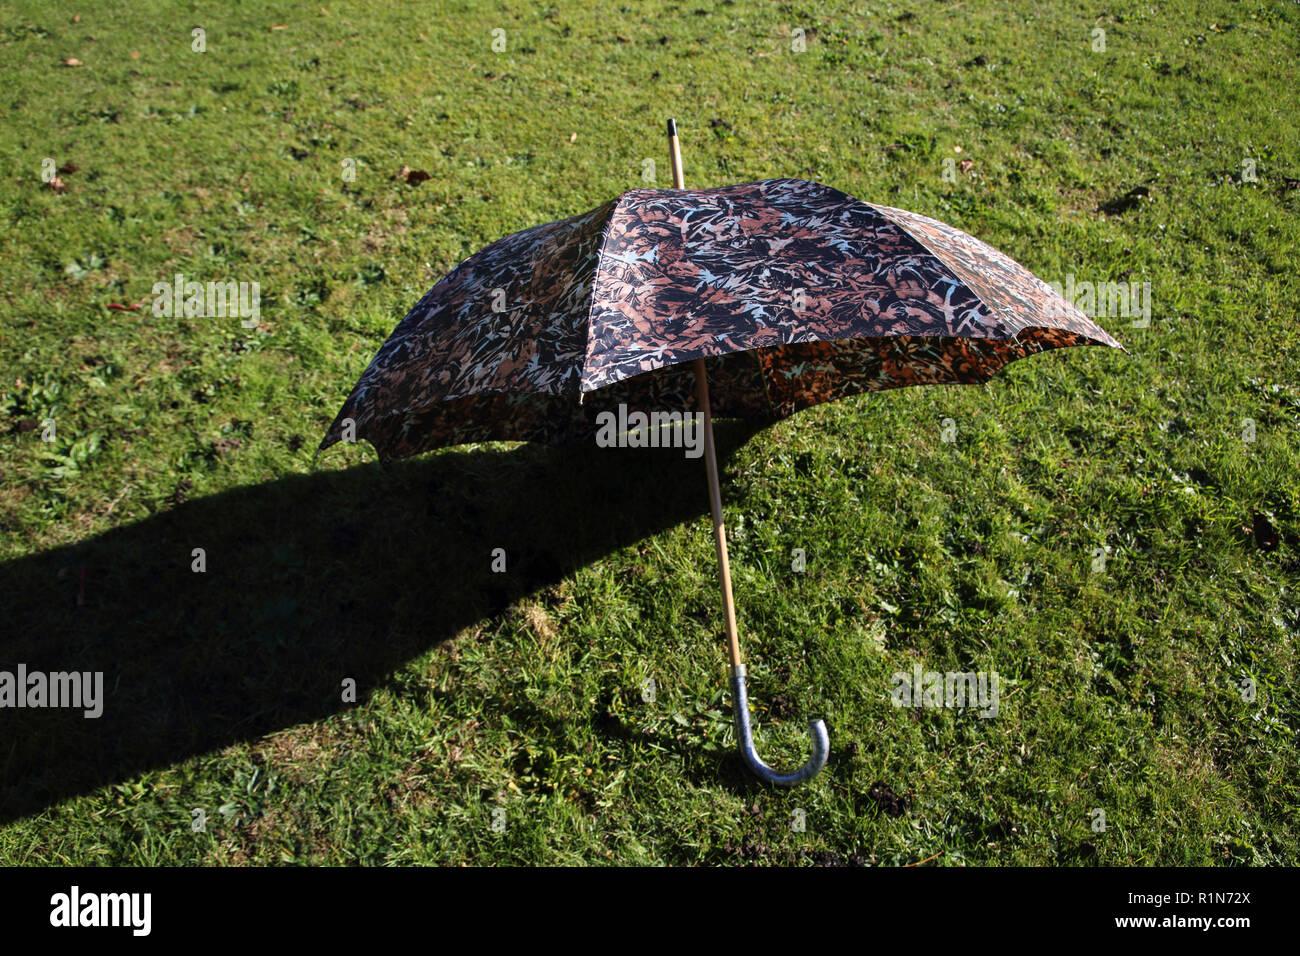 aliexpress gran surtido bueno Valentino paraguas Foto & Imagen De Stock: 224816002 - Alamy